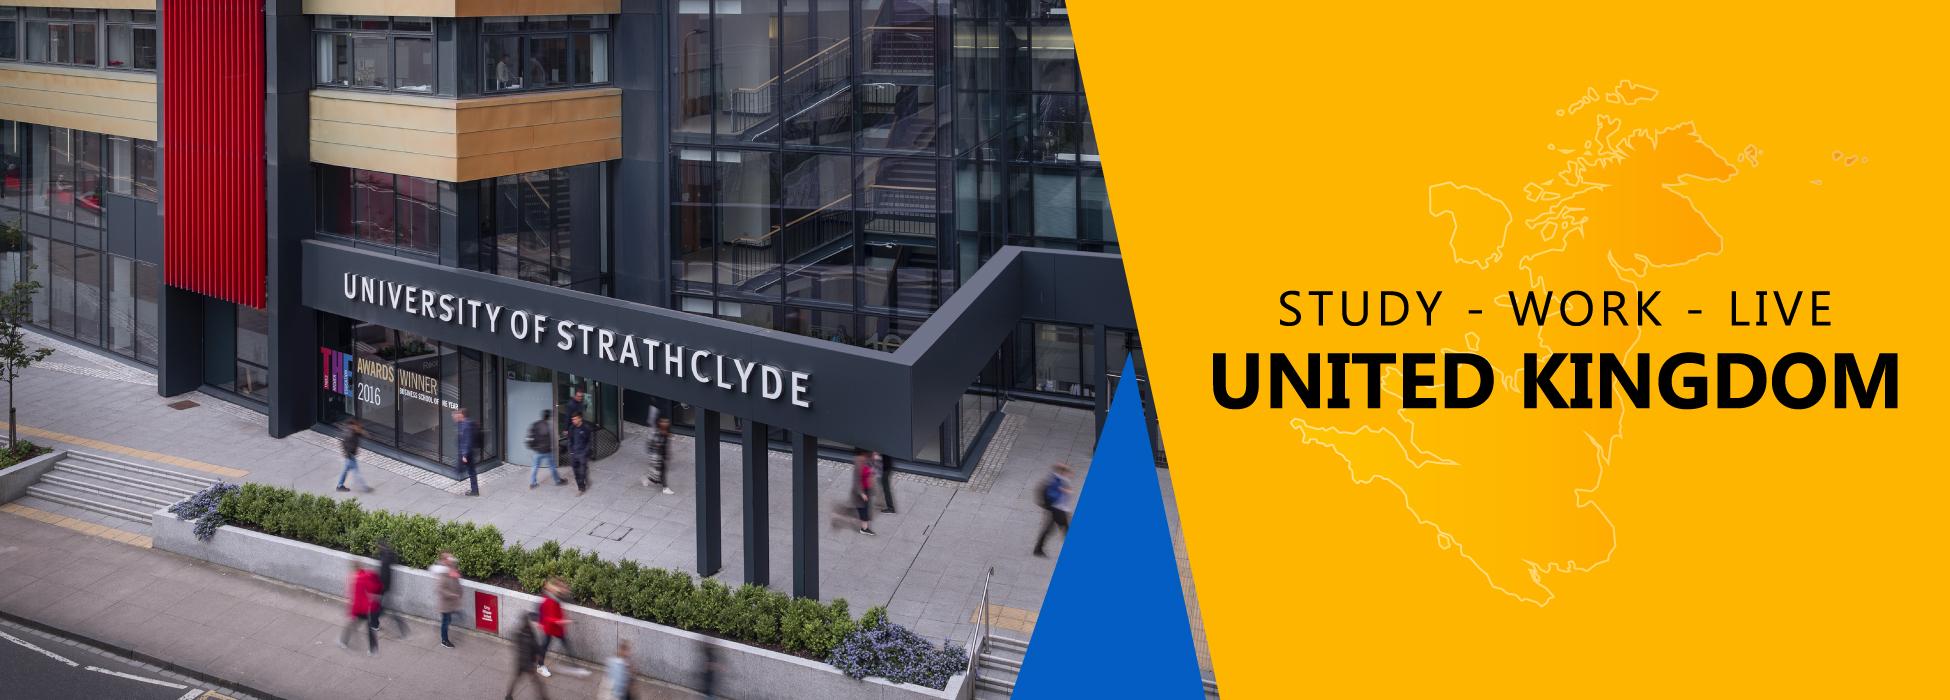 University-of-Strathclyde